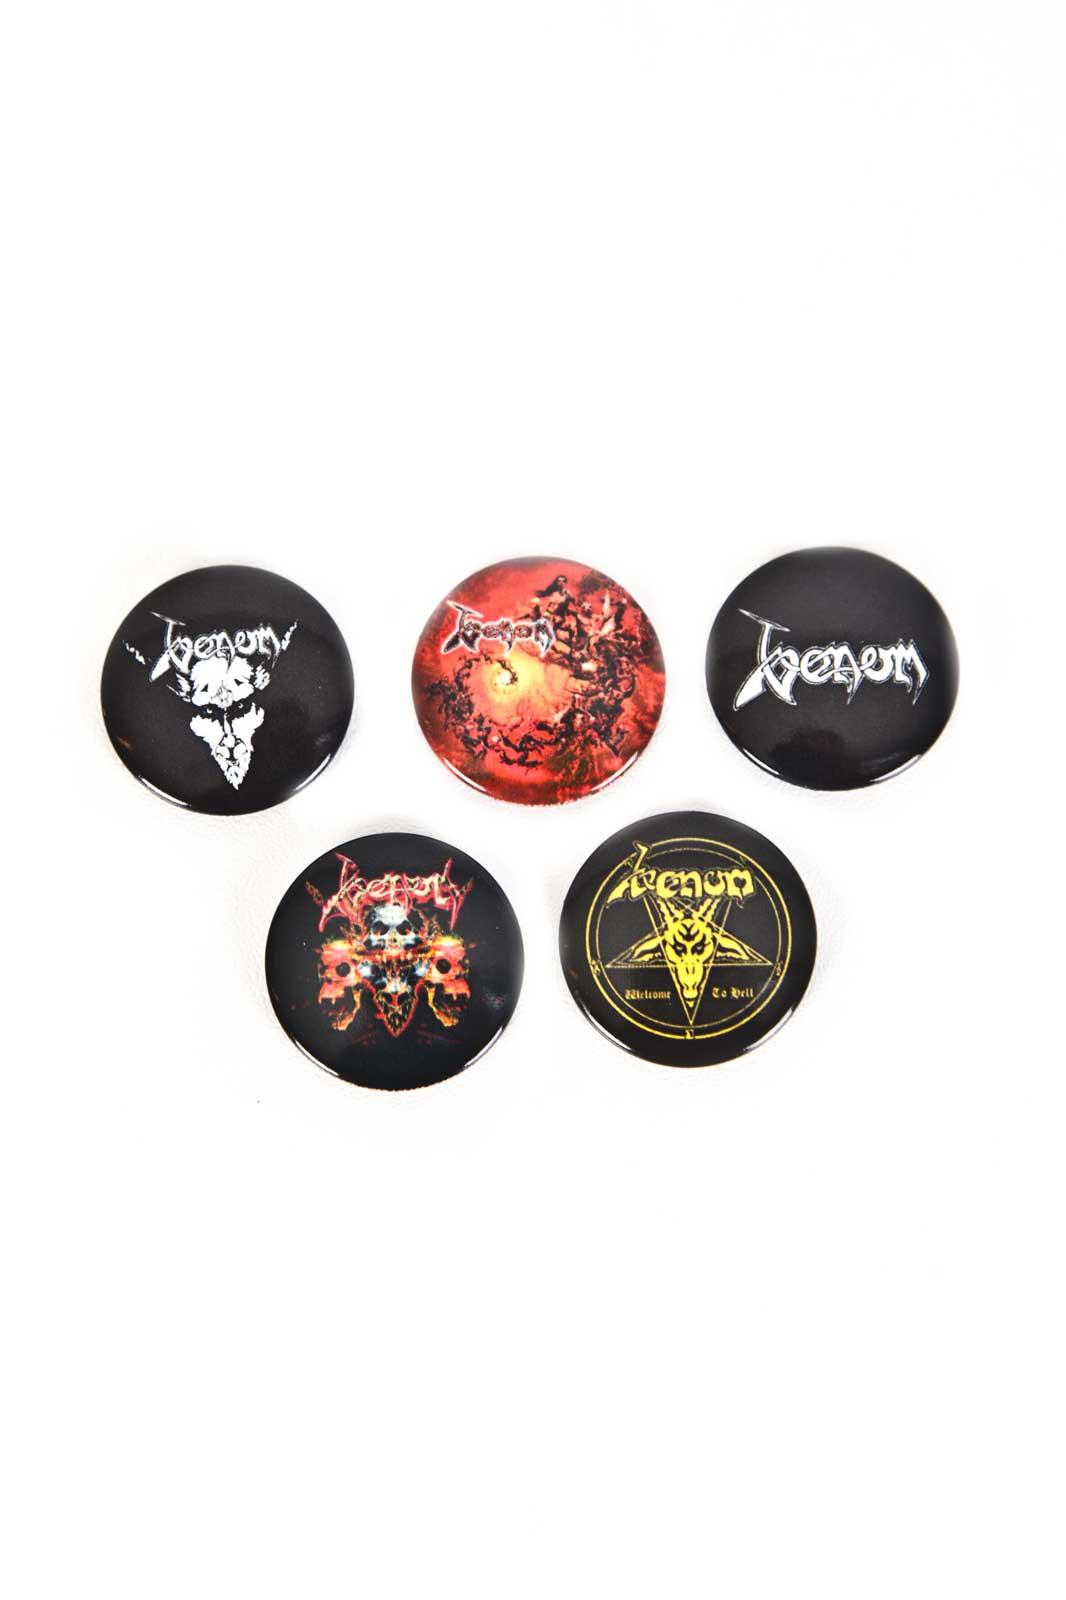 official merchandise venom badge 5-pack